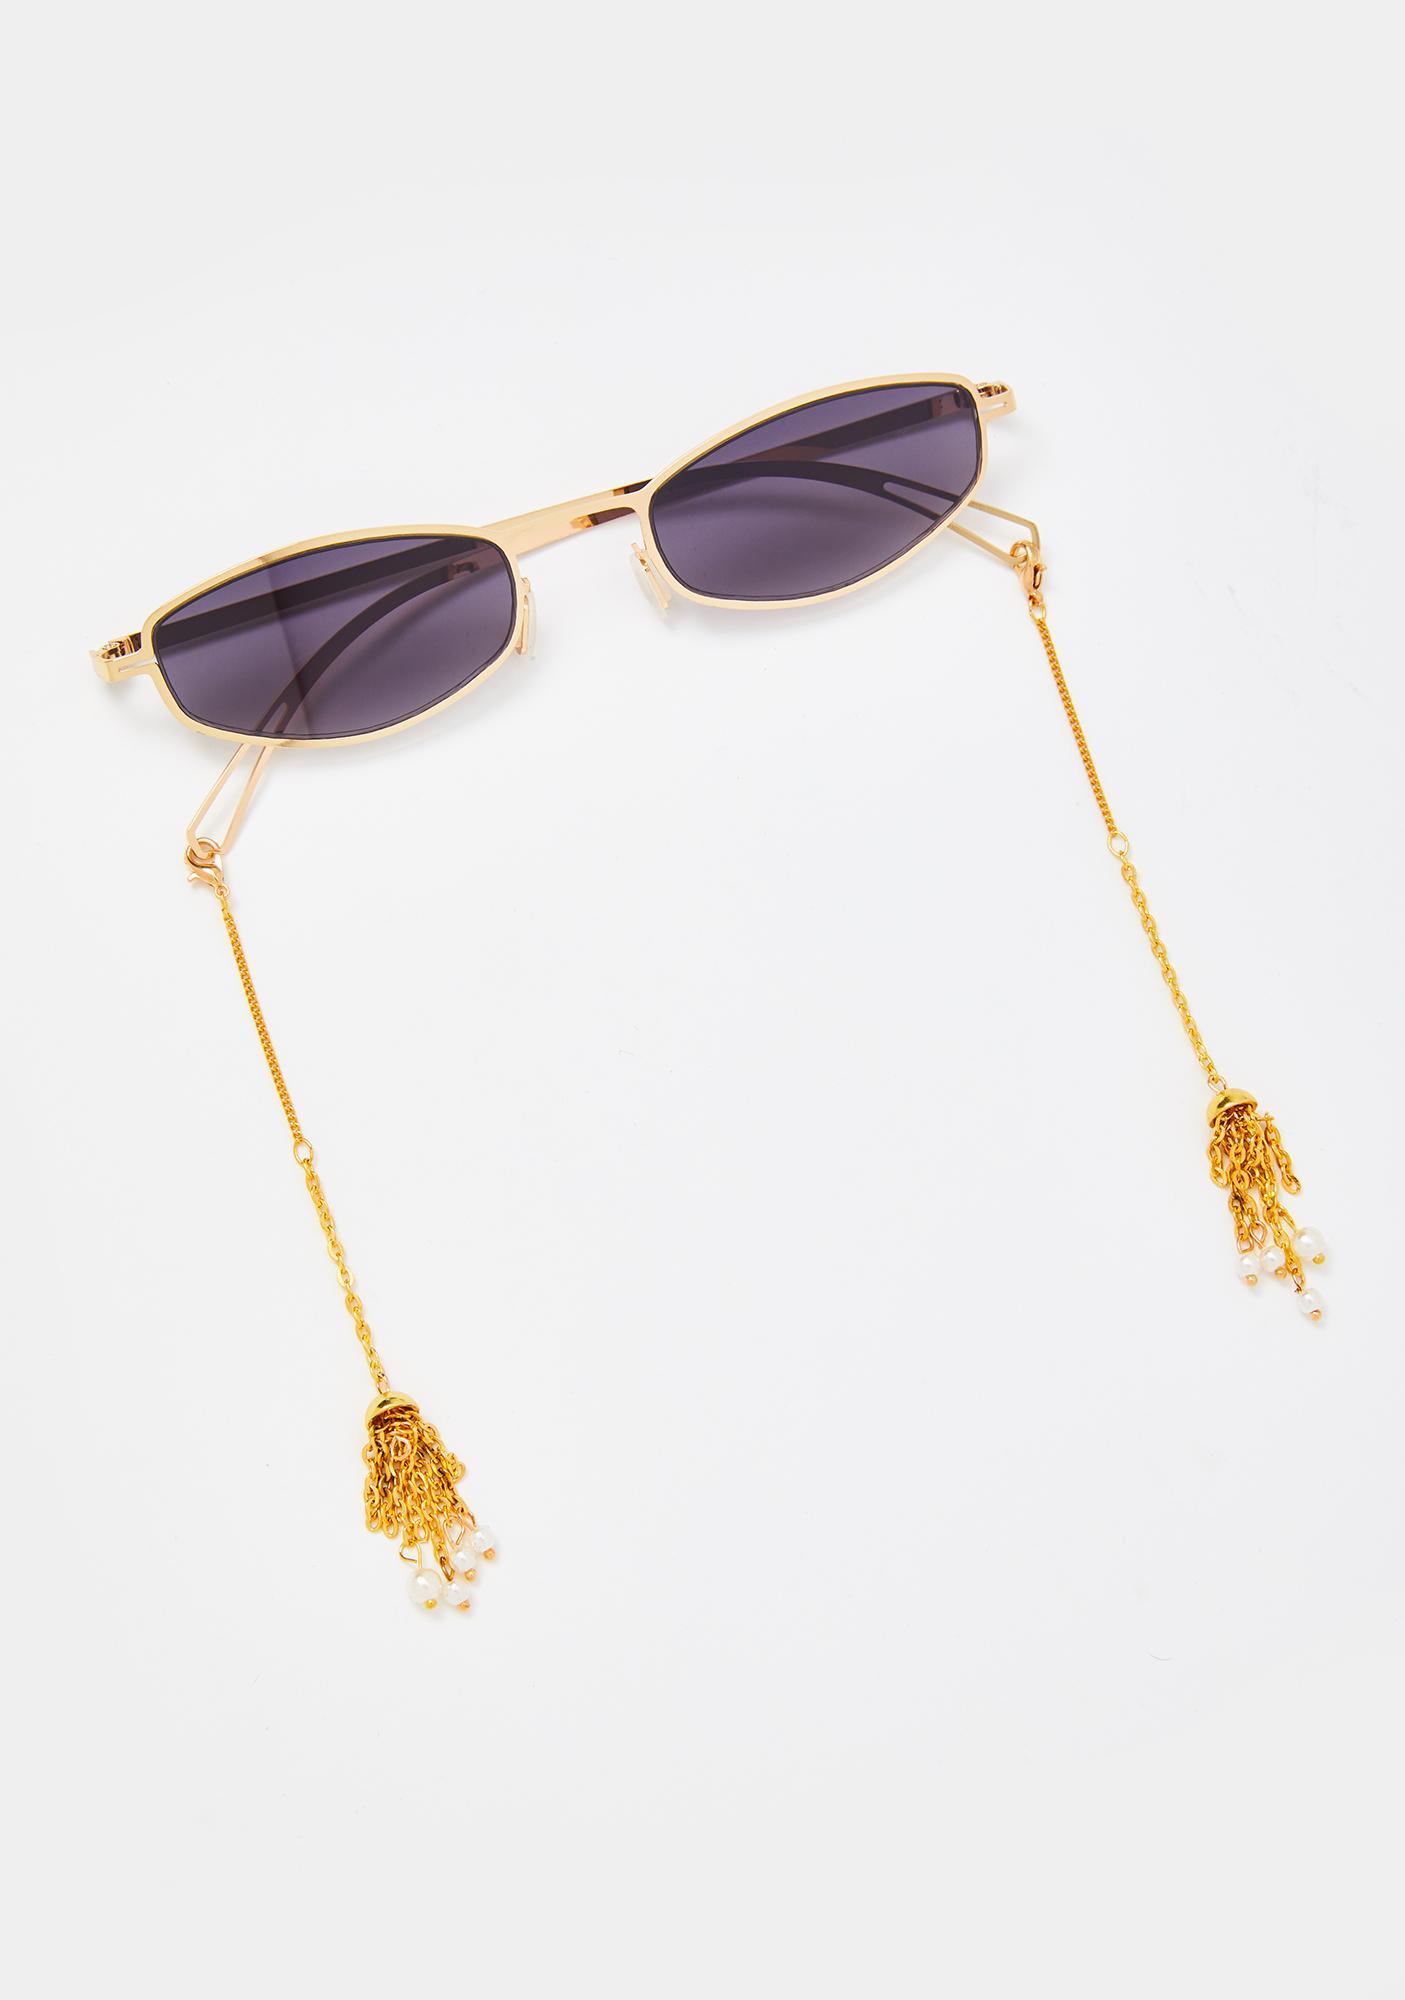 All Dat Tassel Sunglasses